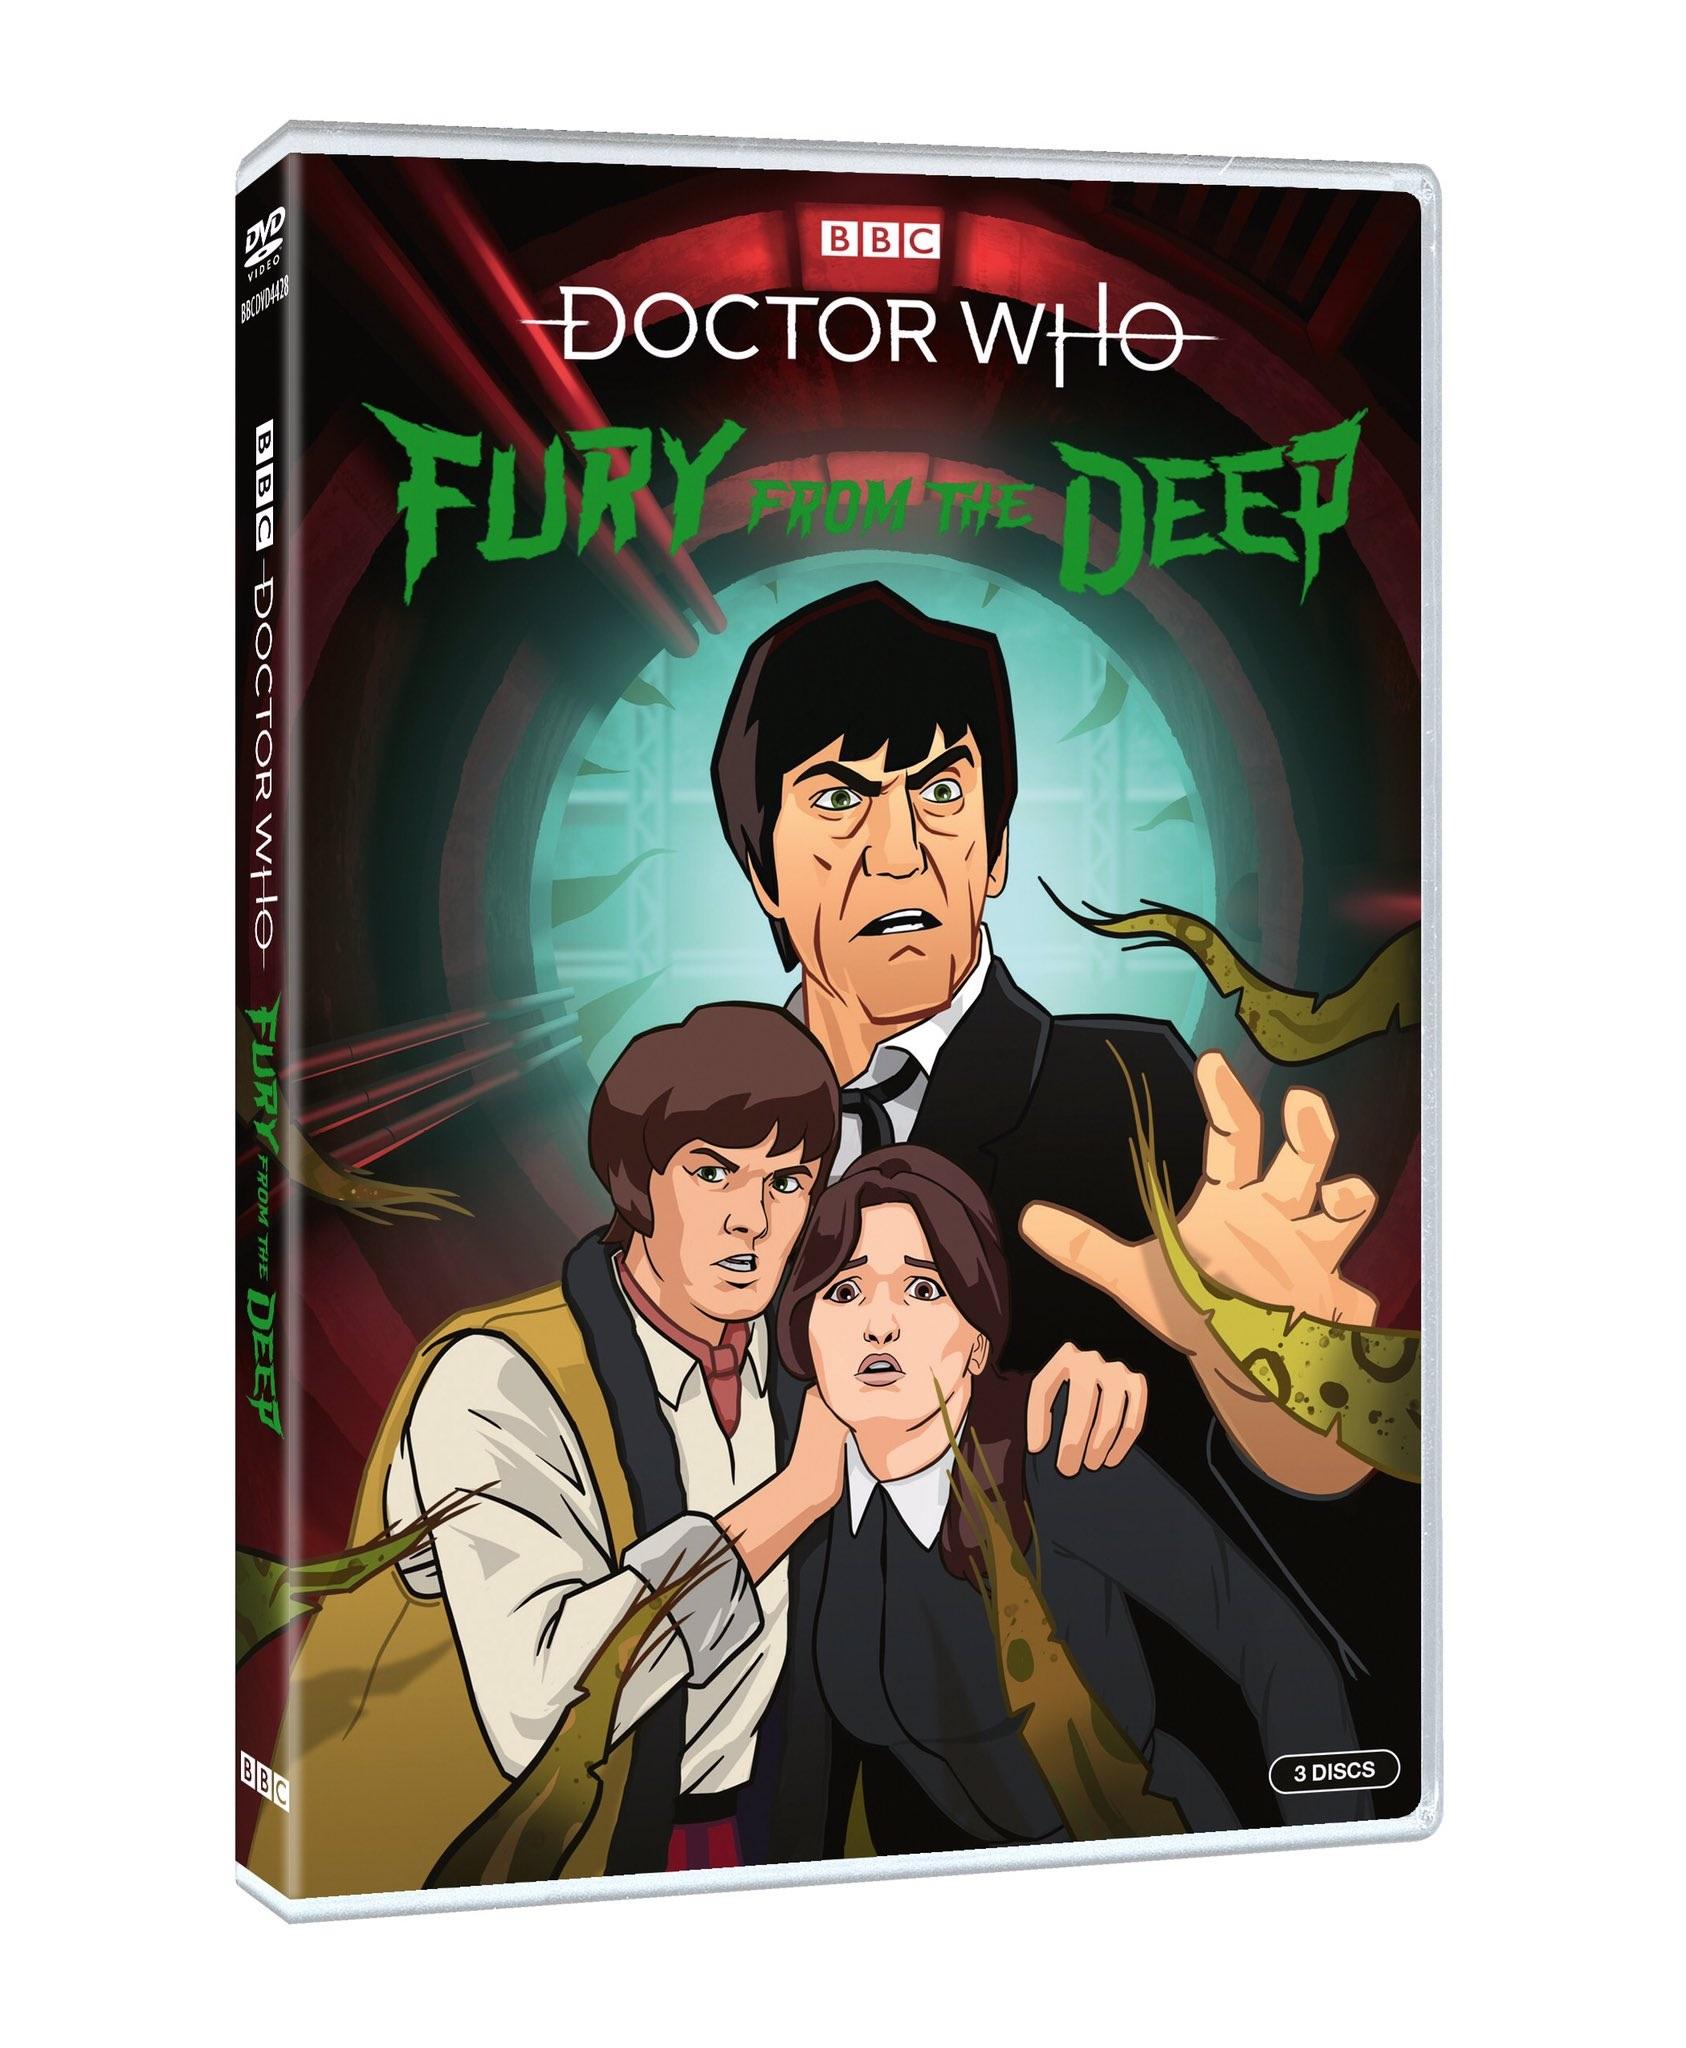 Fury-from-the-Deep-DVD-Blu-ray.jpg?w=1686&ssl=1